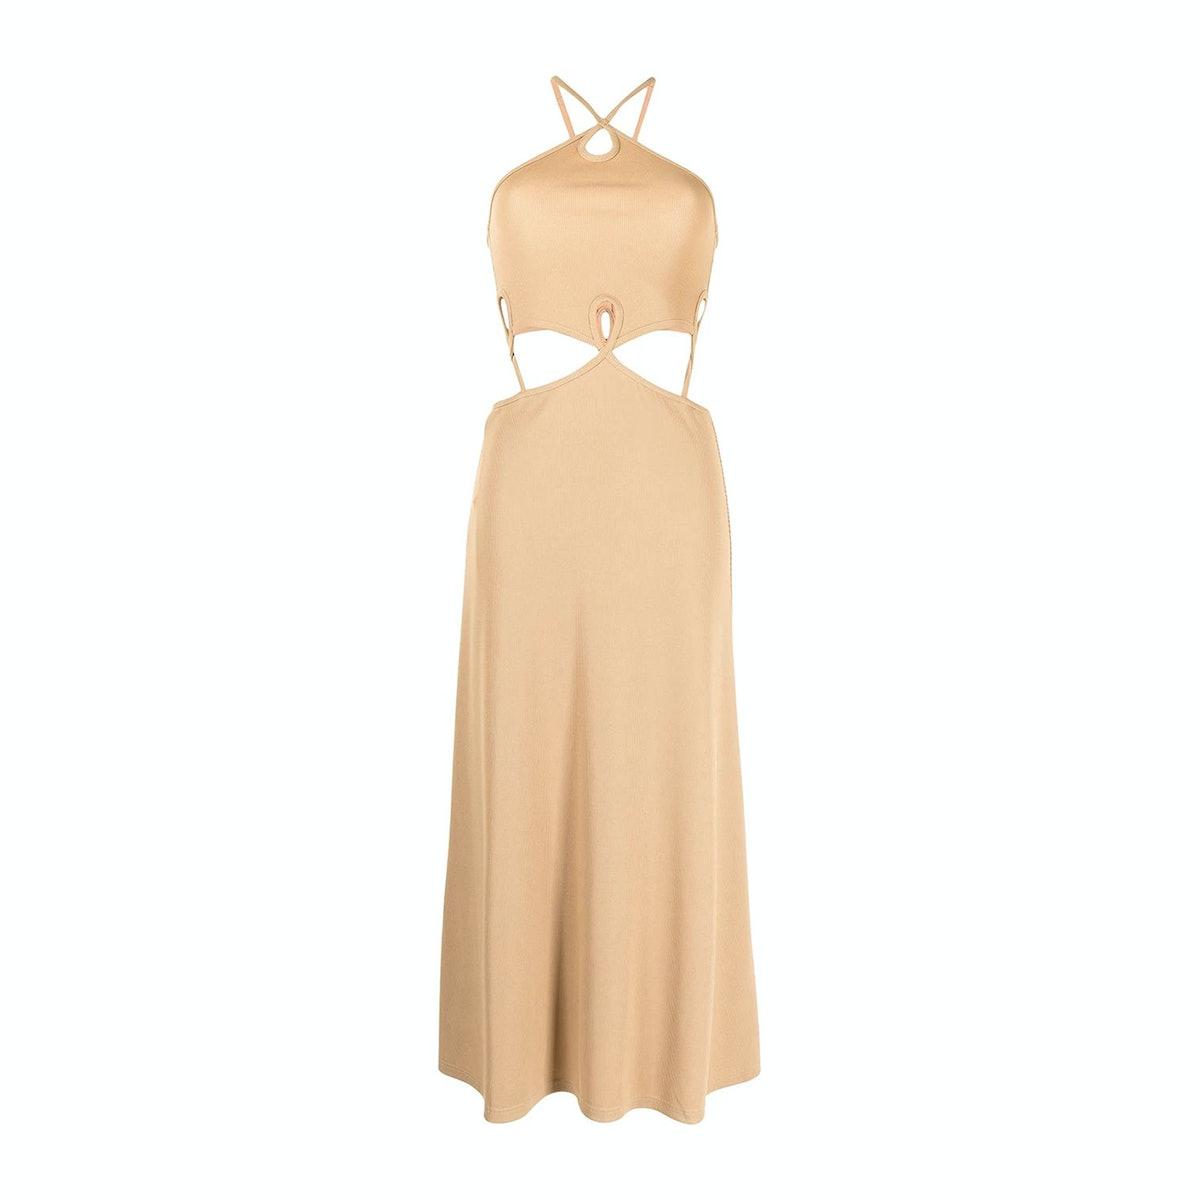 Christopher Esber Looped Cutaway Sleeveless Dress